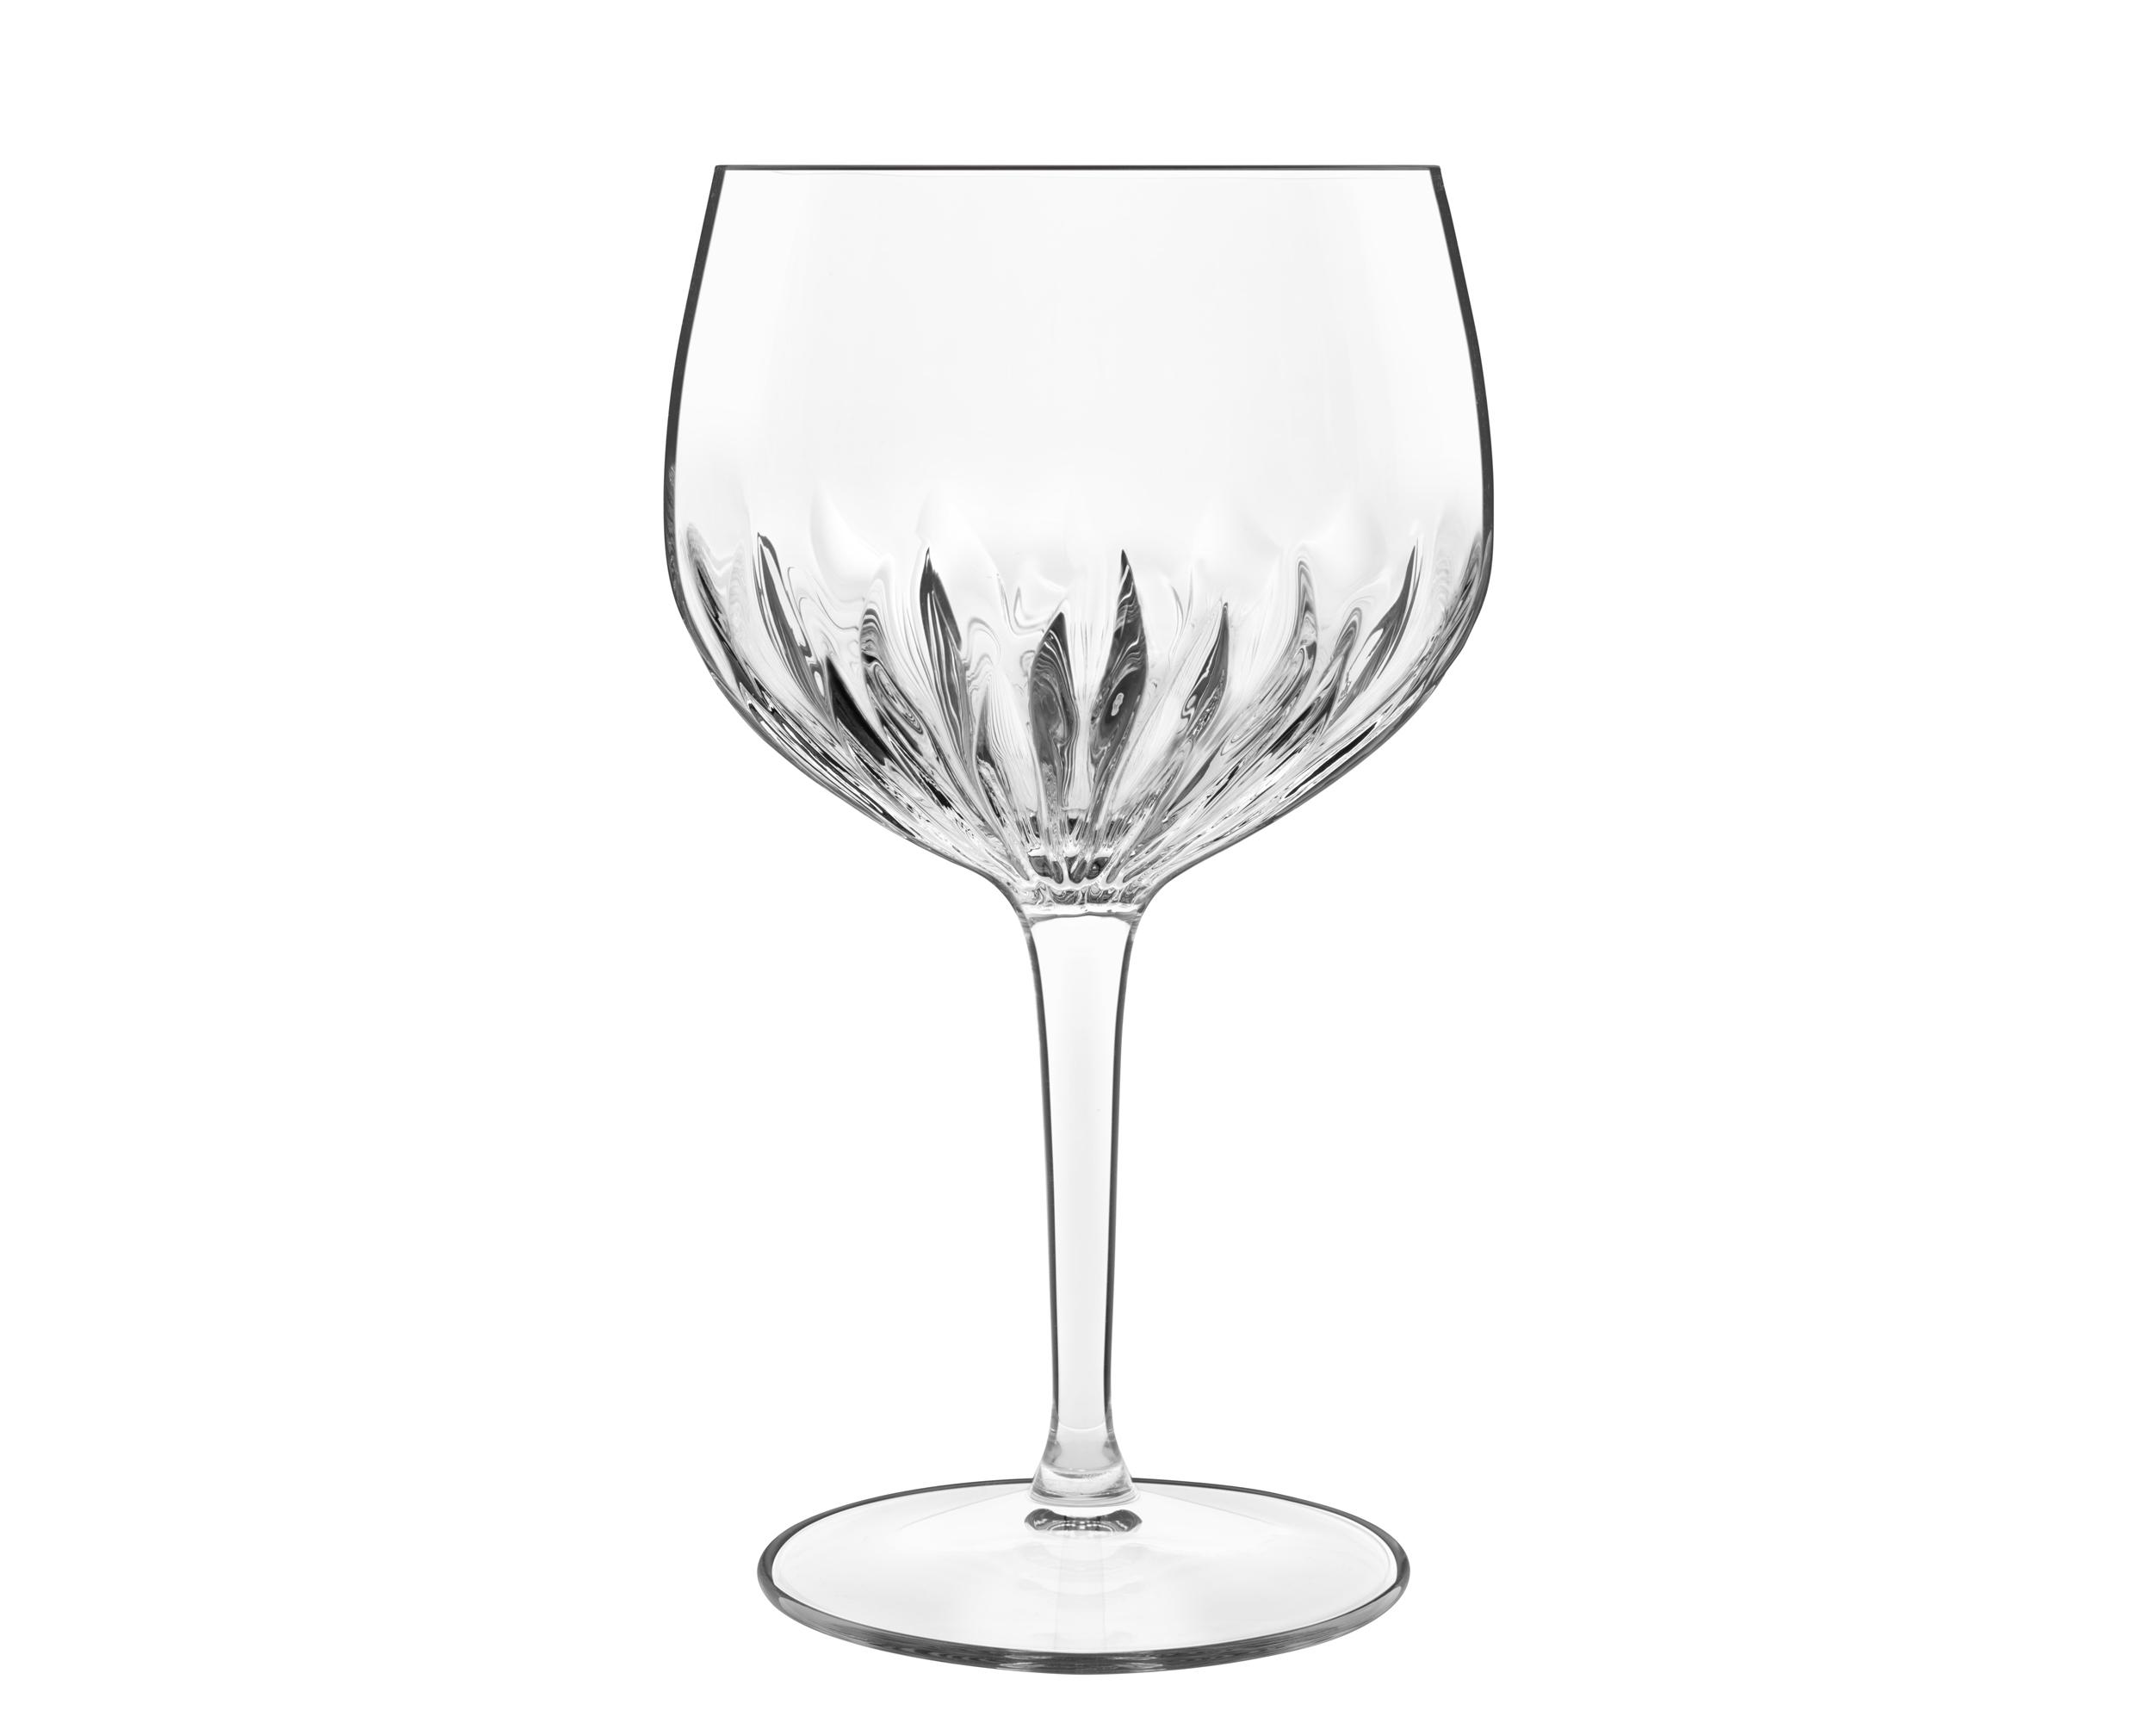 Luigi Bormioli Mixology G&T glas, 800 ml